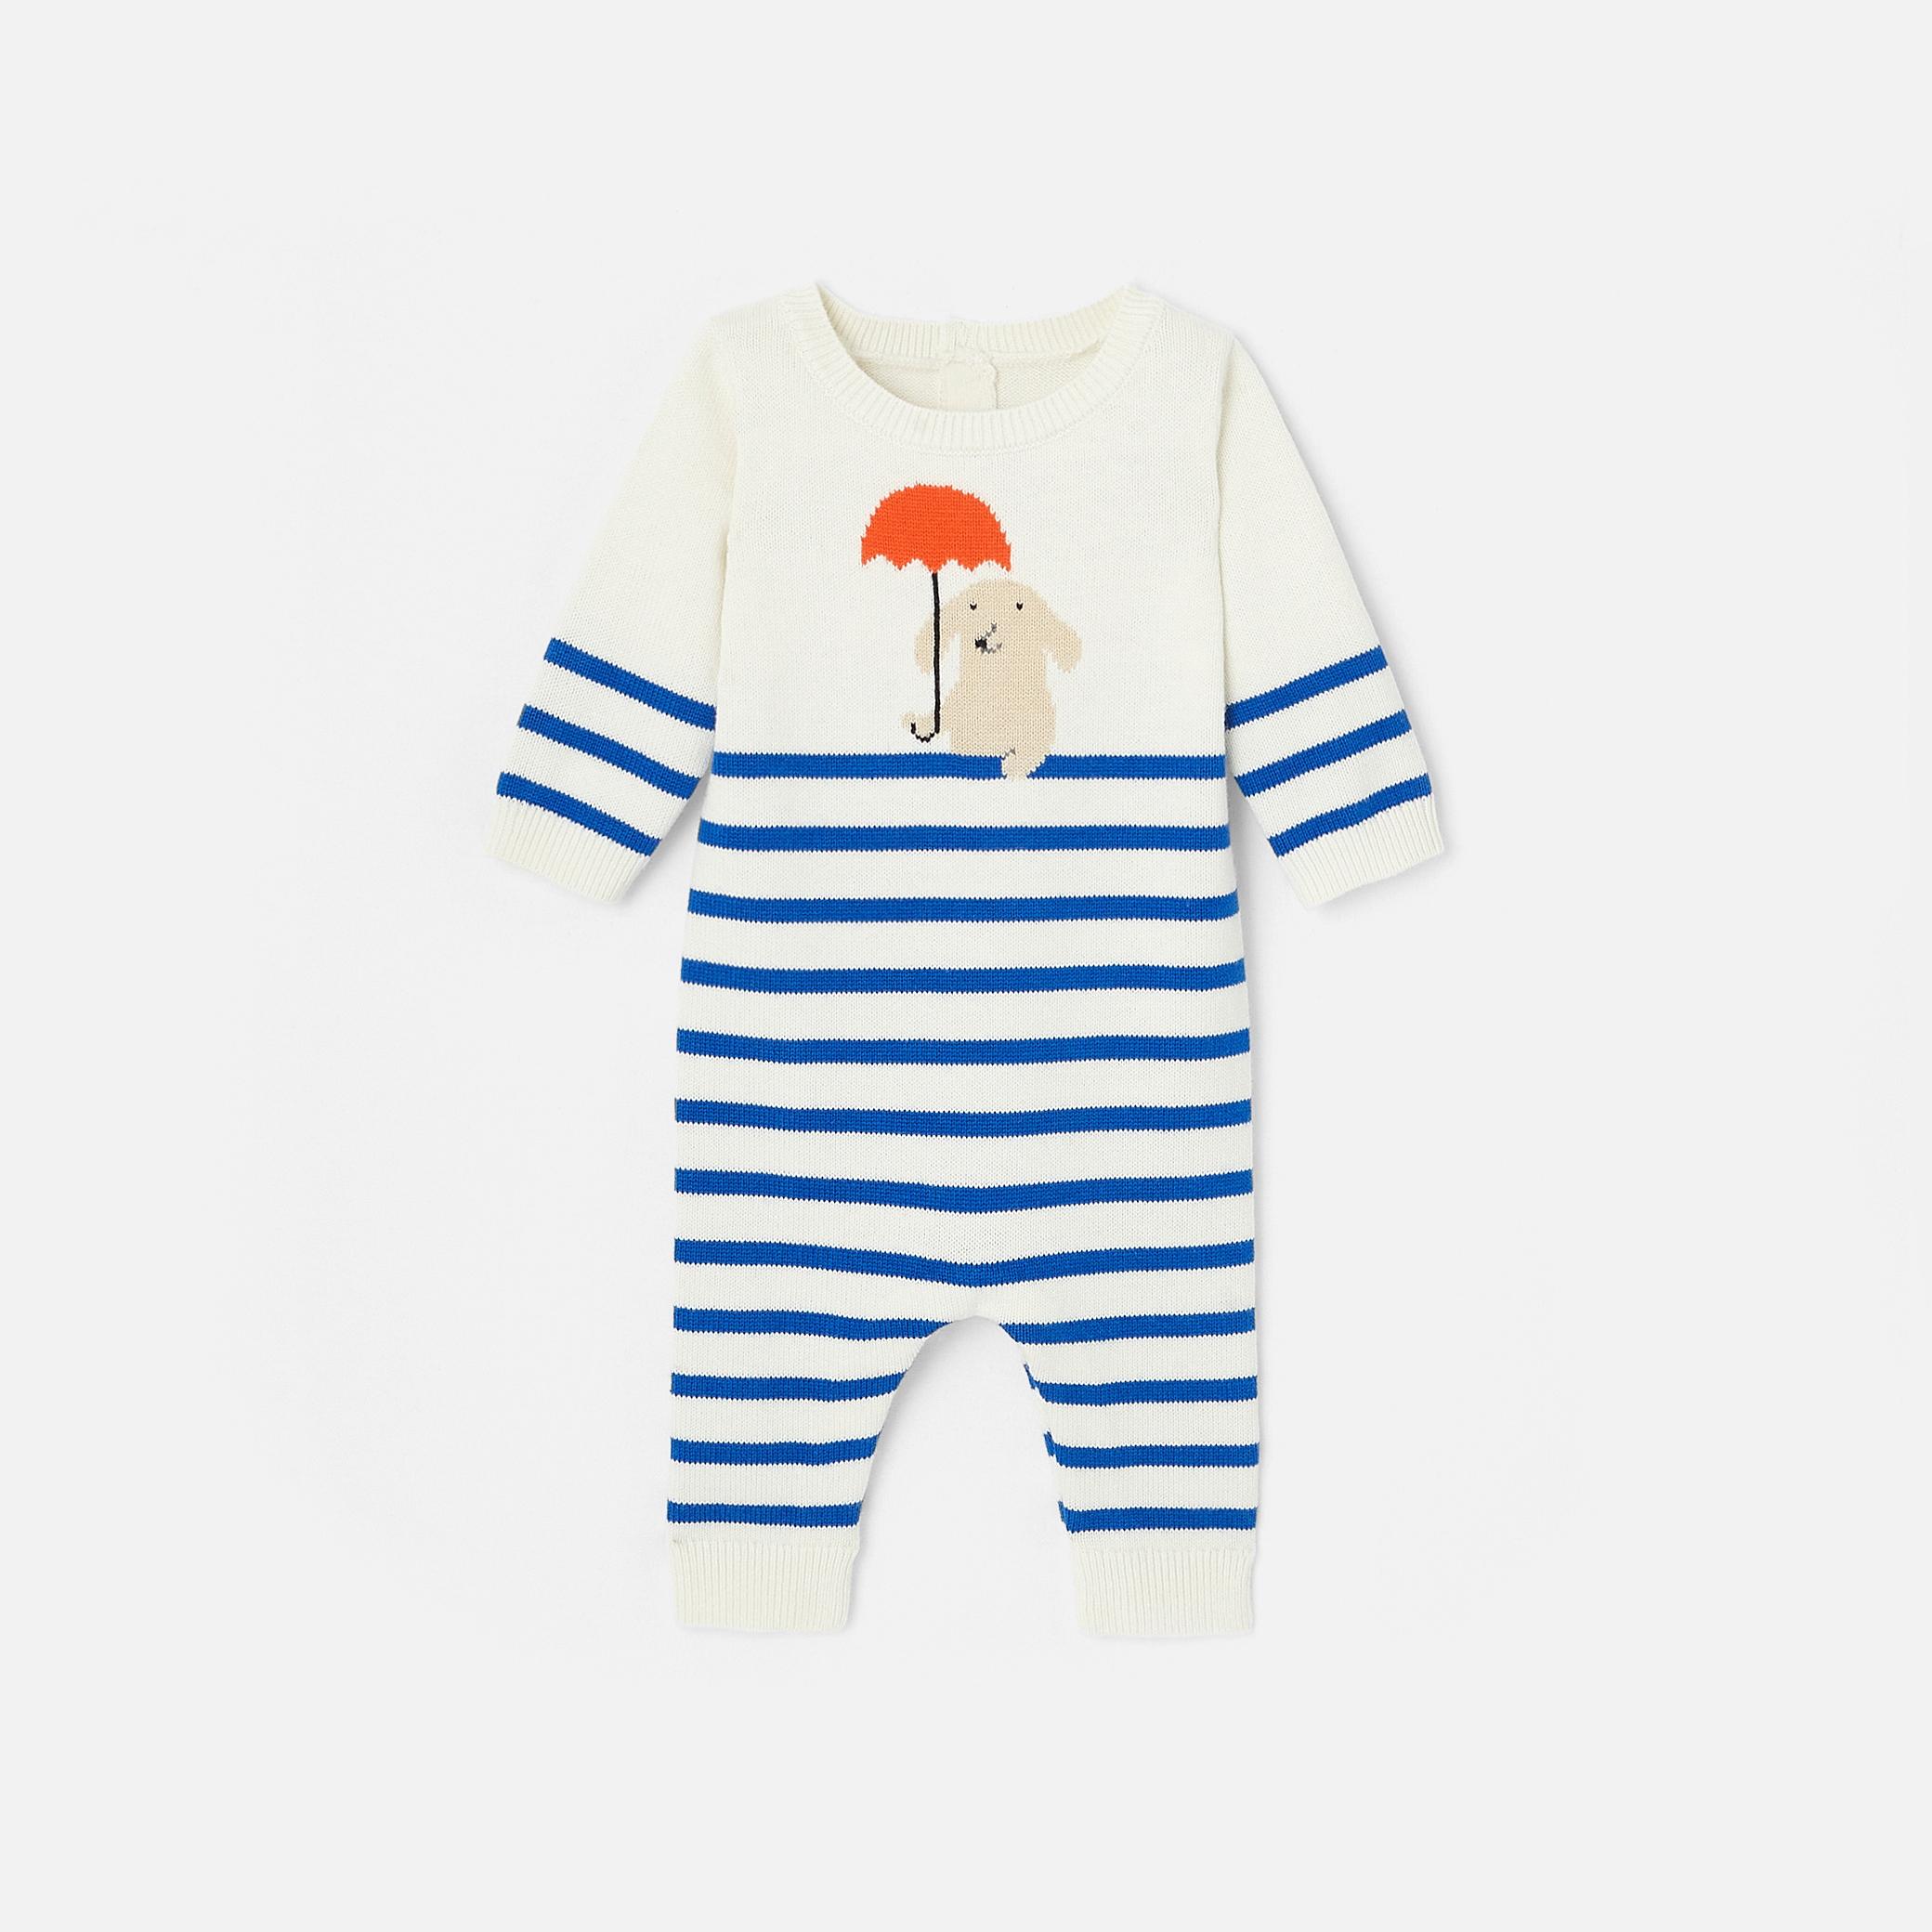 Baby boys striped onesie